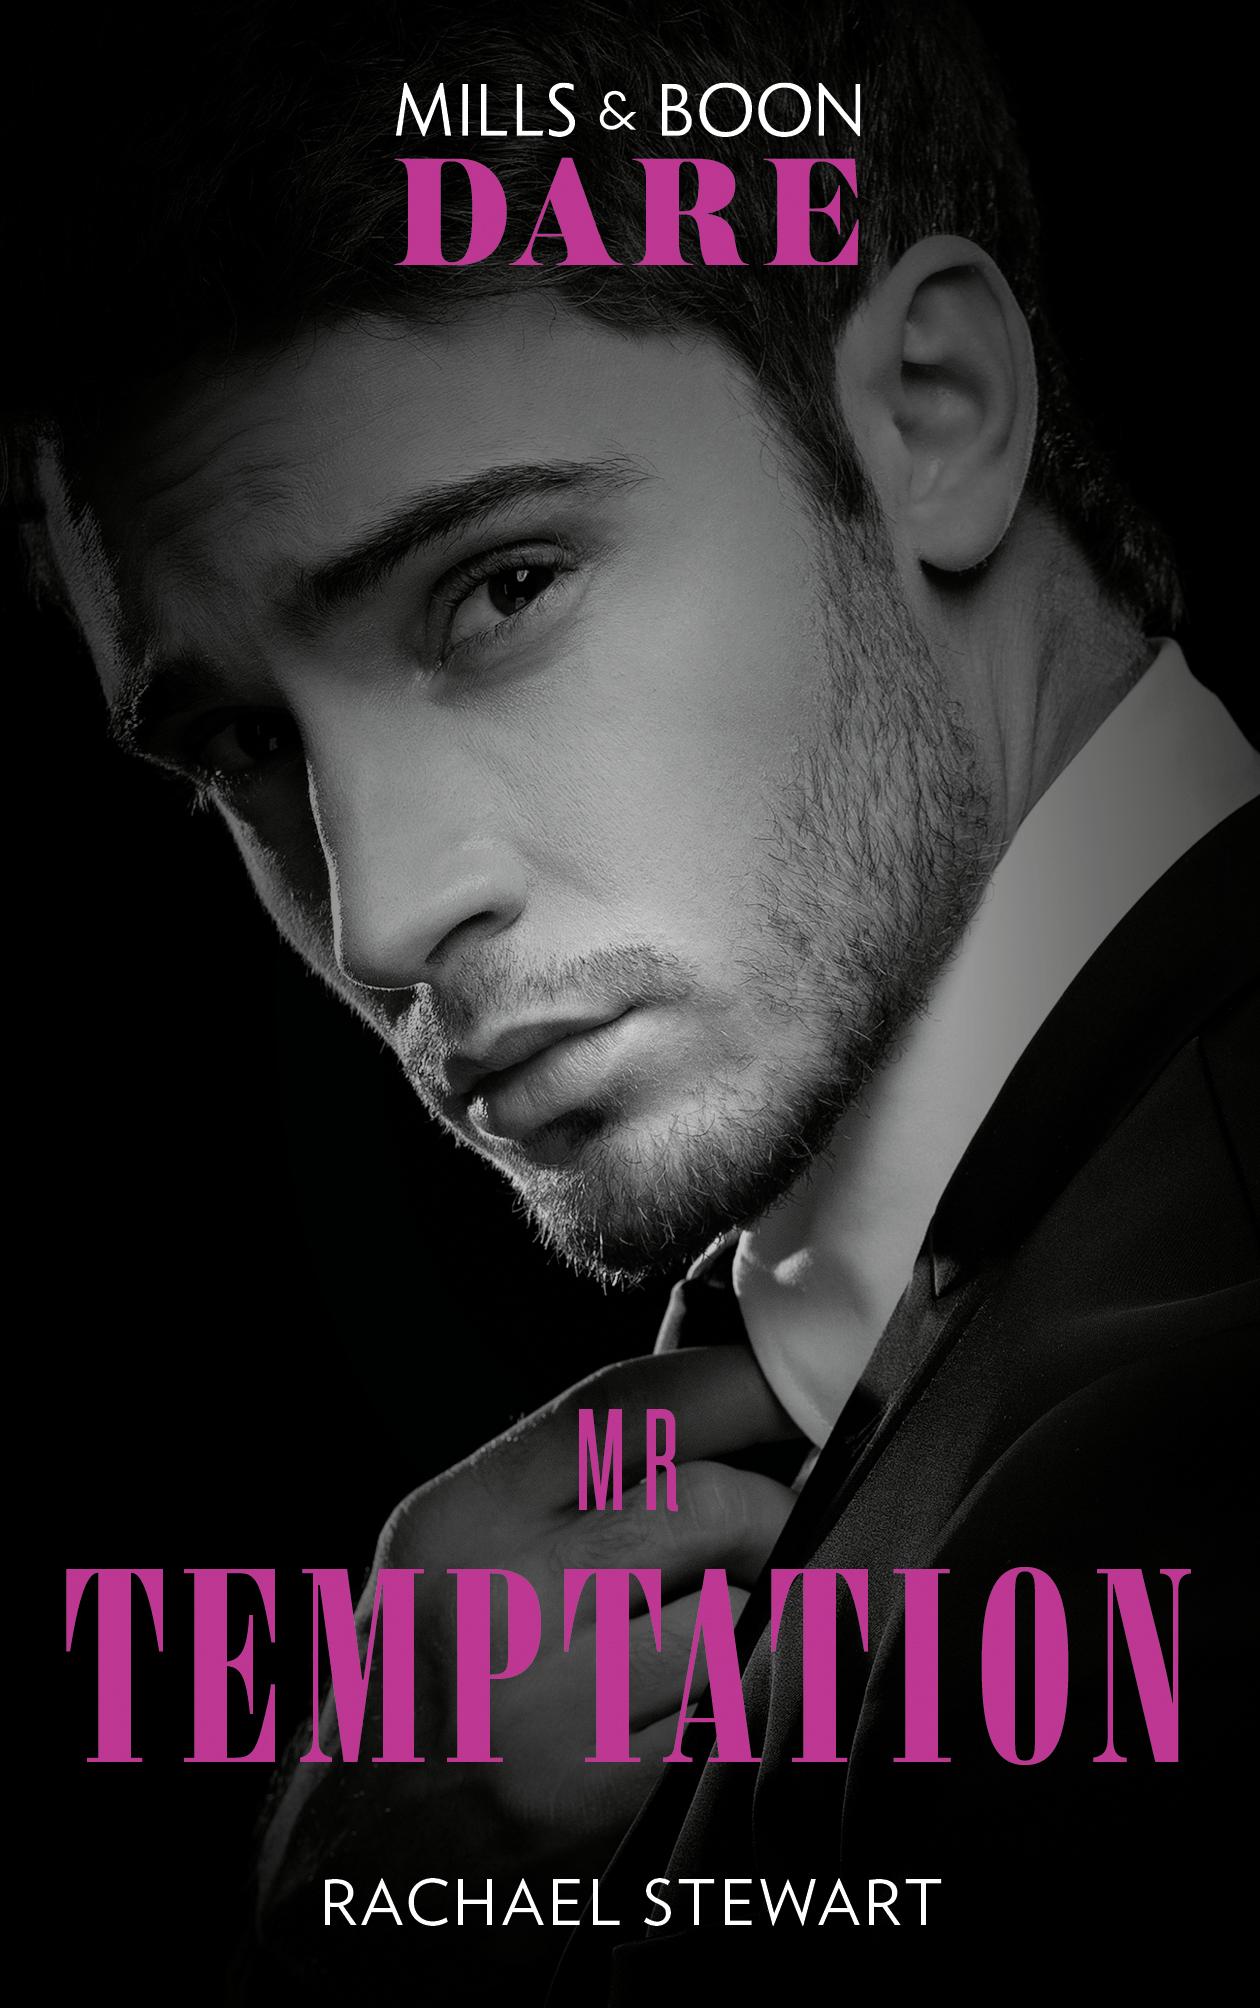 Mr Temptation